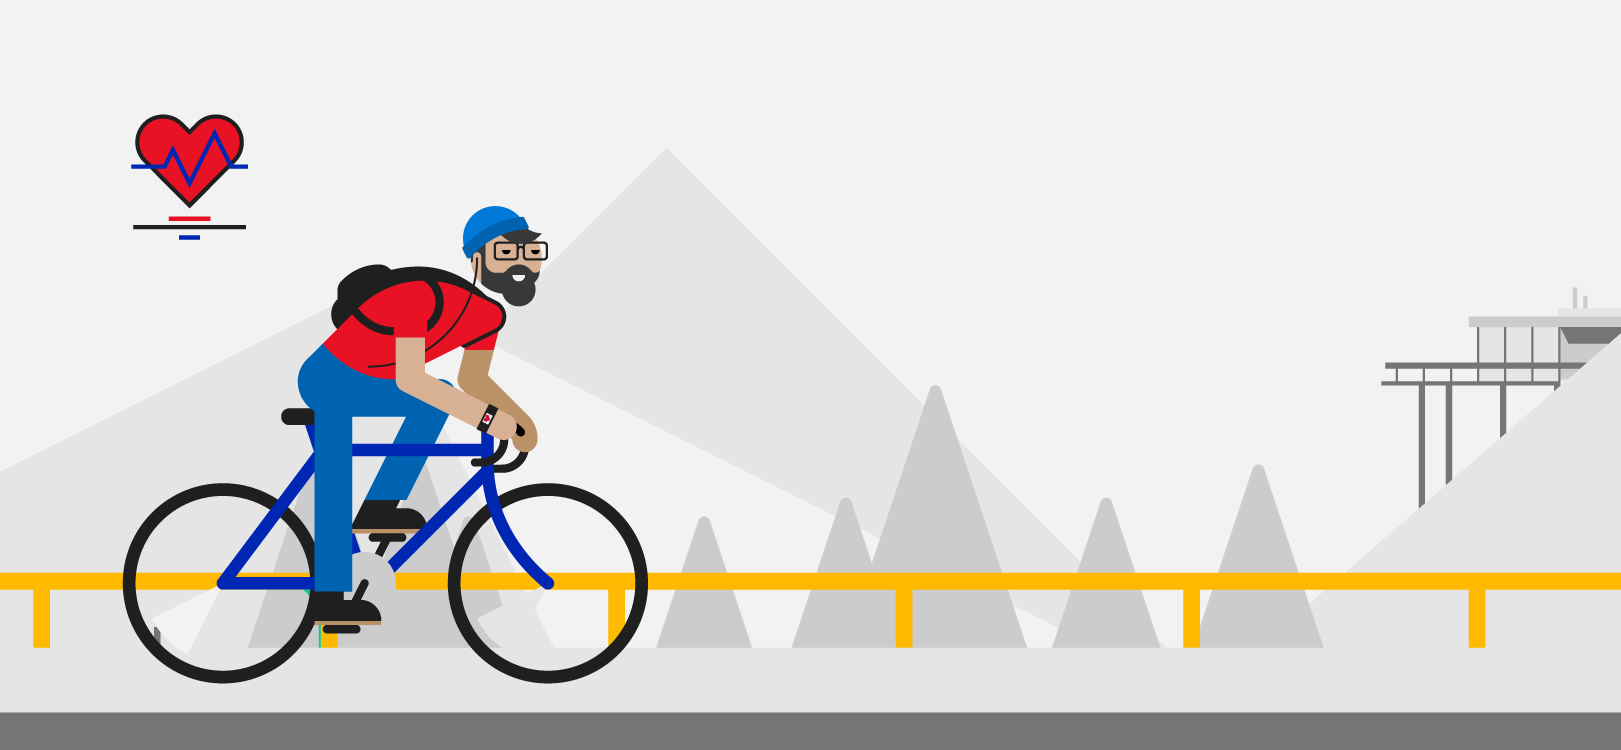 Az utcán bicikliző férfi